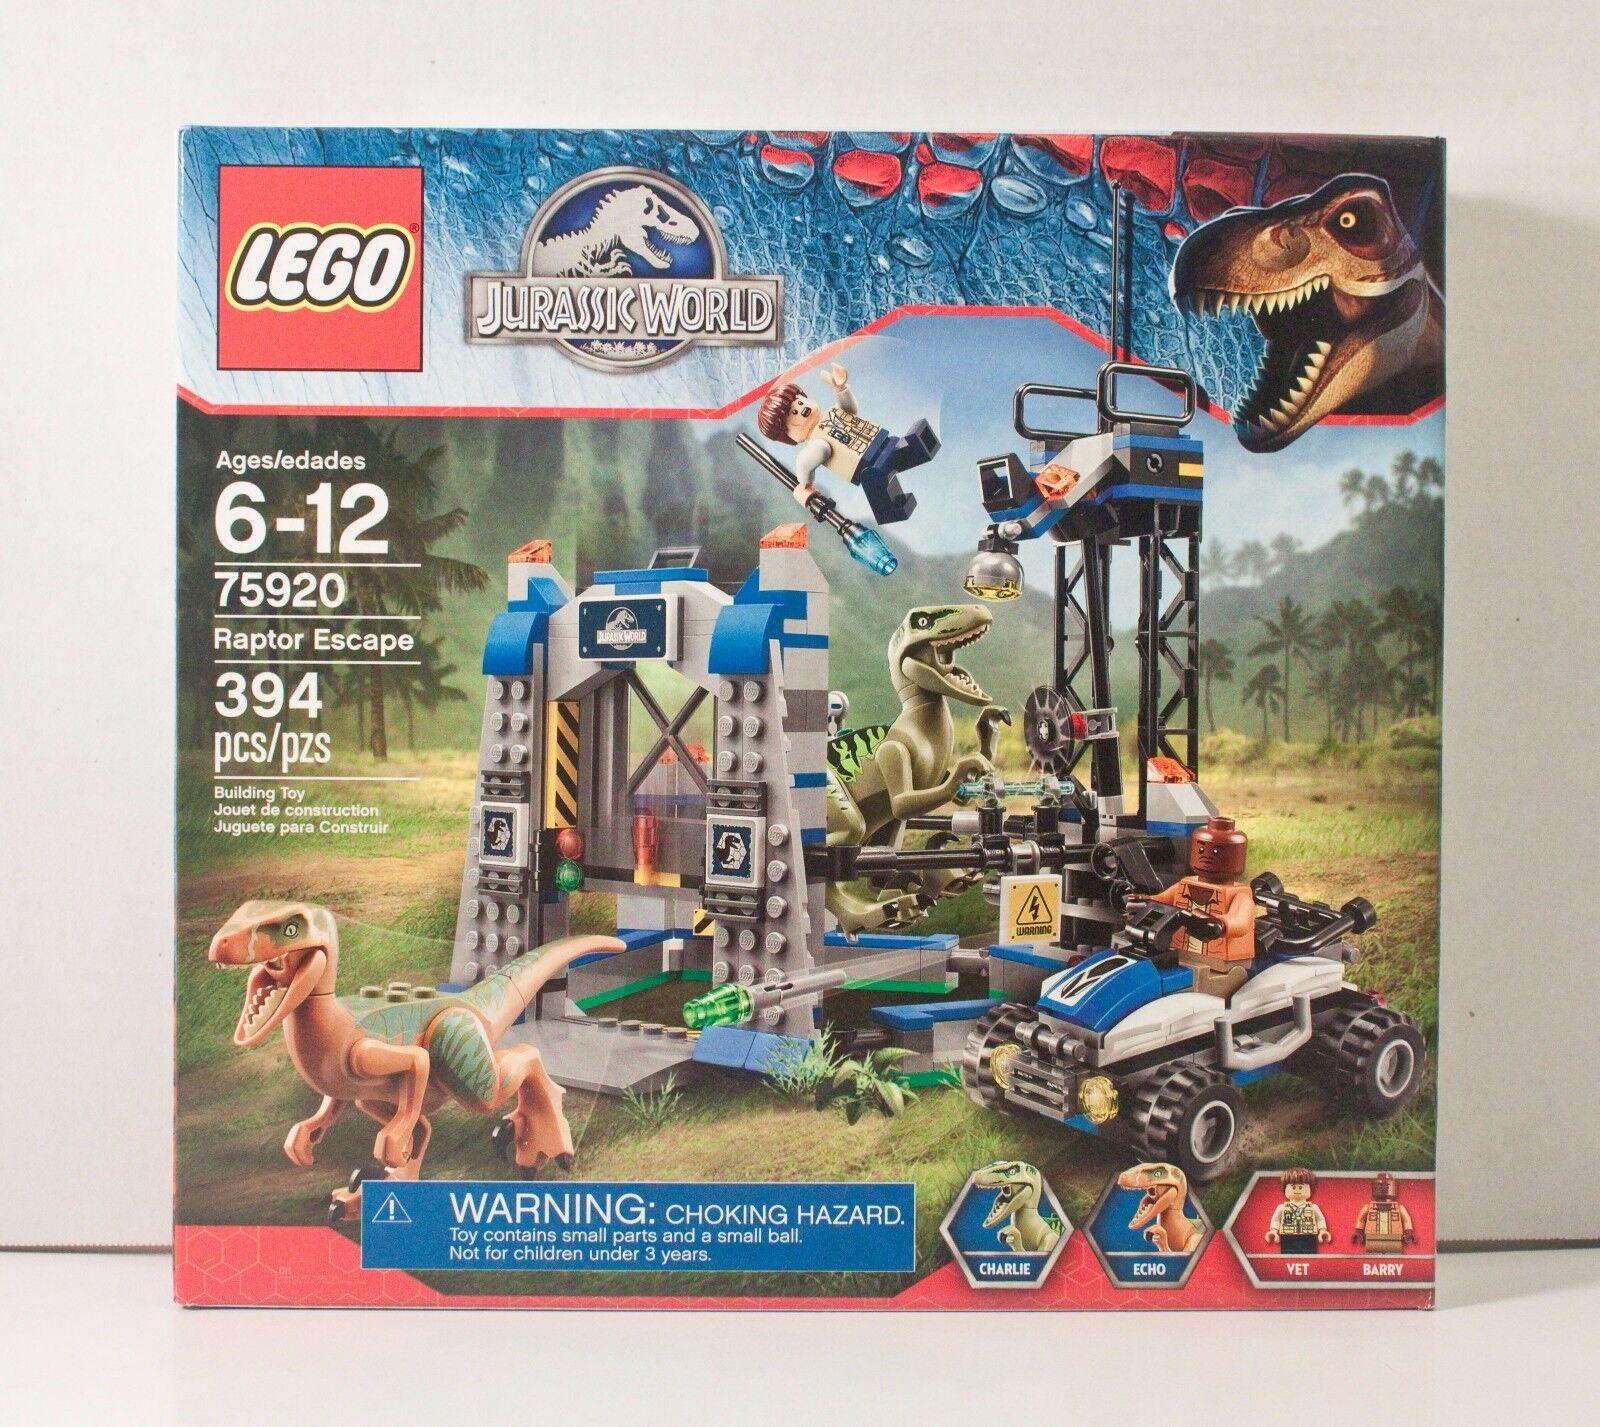 LEGO Jurassic World RAPTOR ESCAPE 75920 Dinosaurs CHARLIE ECHO Minifigure SEALED